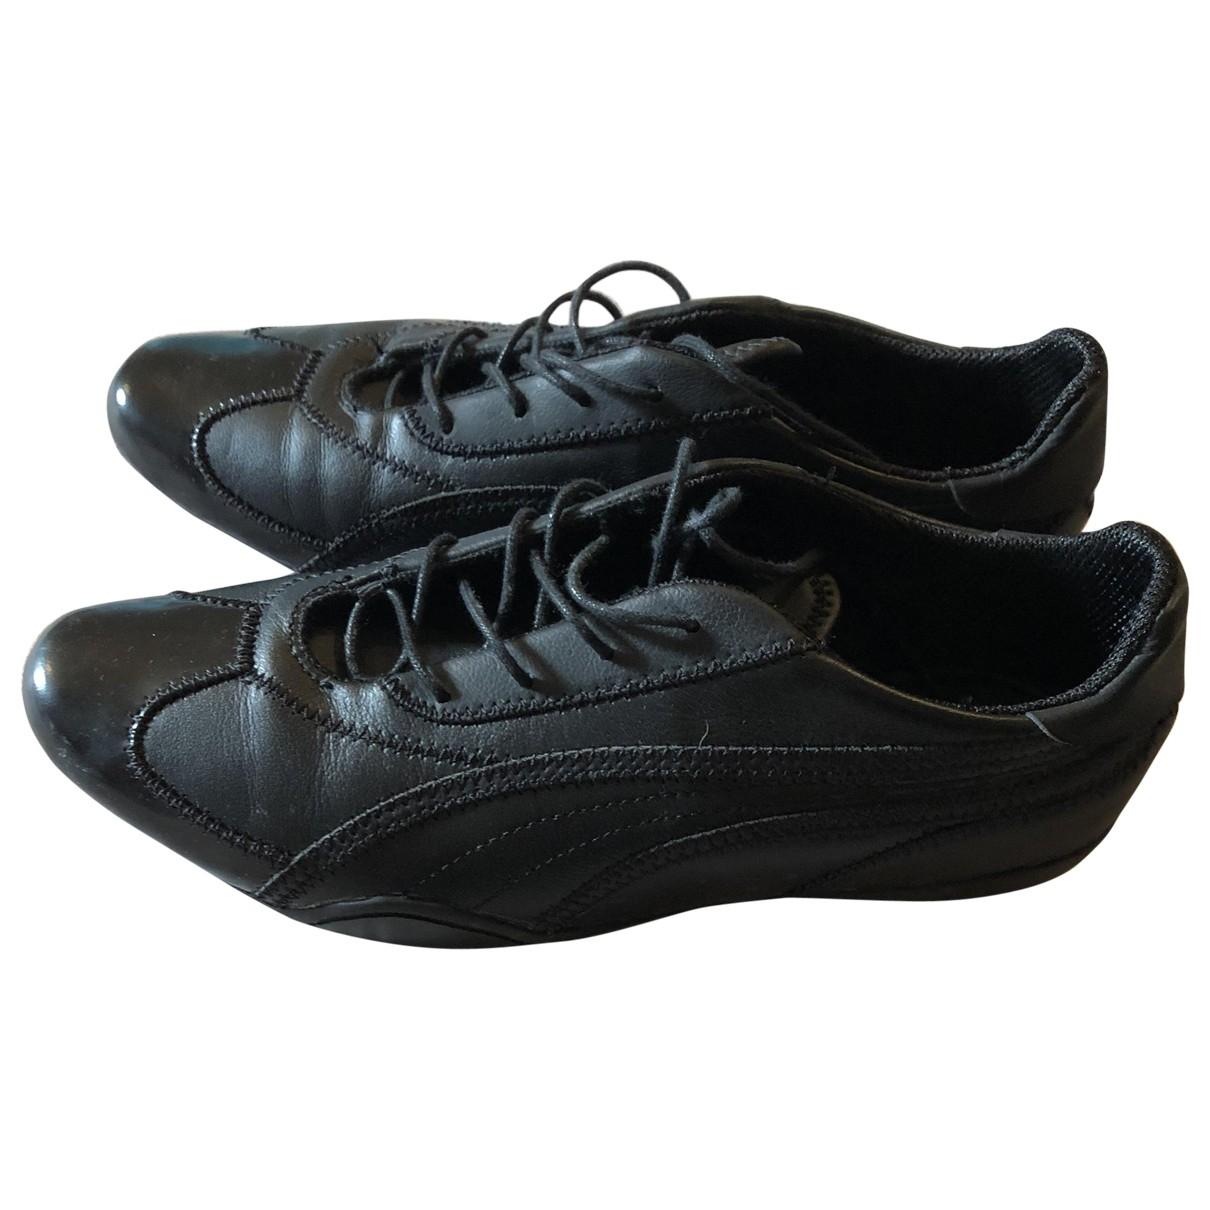 Puma \N Black Leather Trainers for Women 5 UK